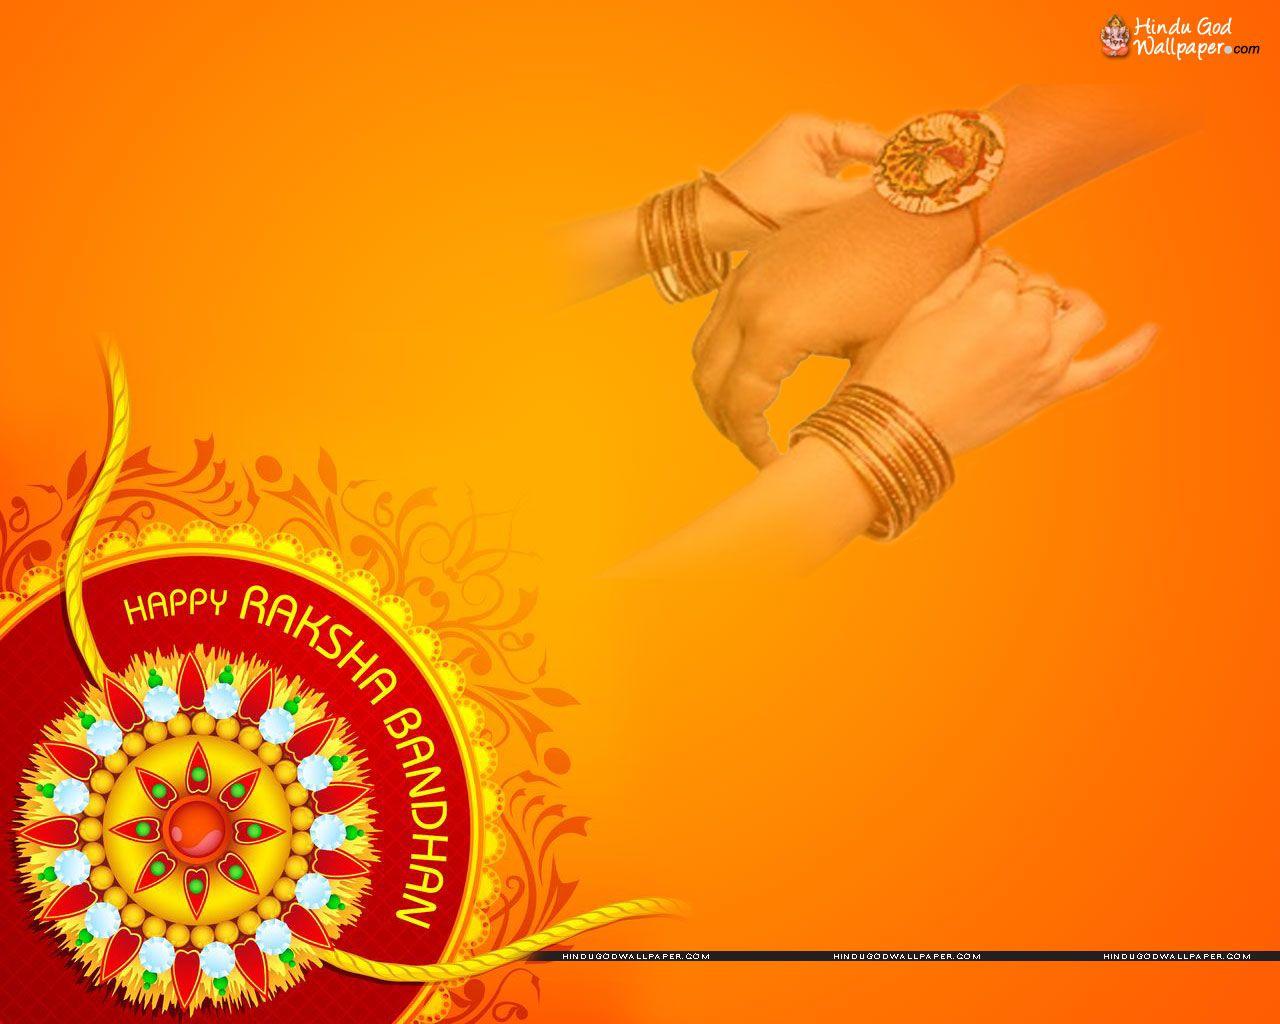 Raksha Bandhan 2014 Wallpapers Hd Free Download In 2020 Happy Rakshabandhan Happy Raksha Bandhan Images Raksha Bandhan Images